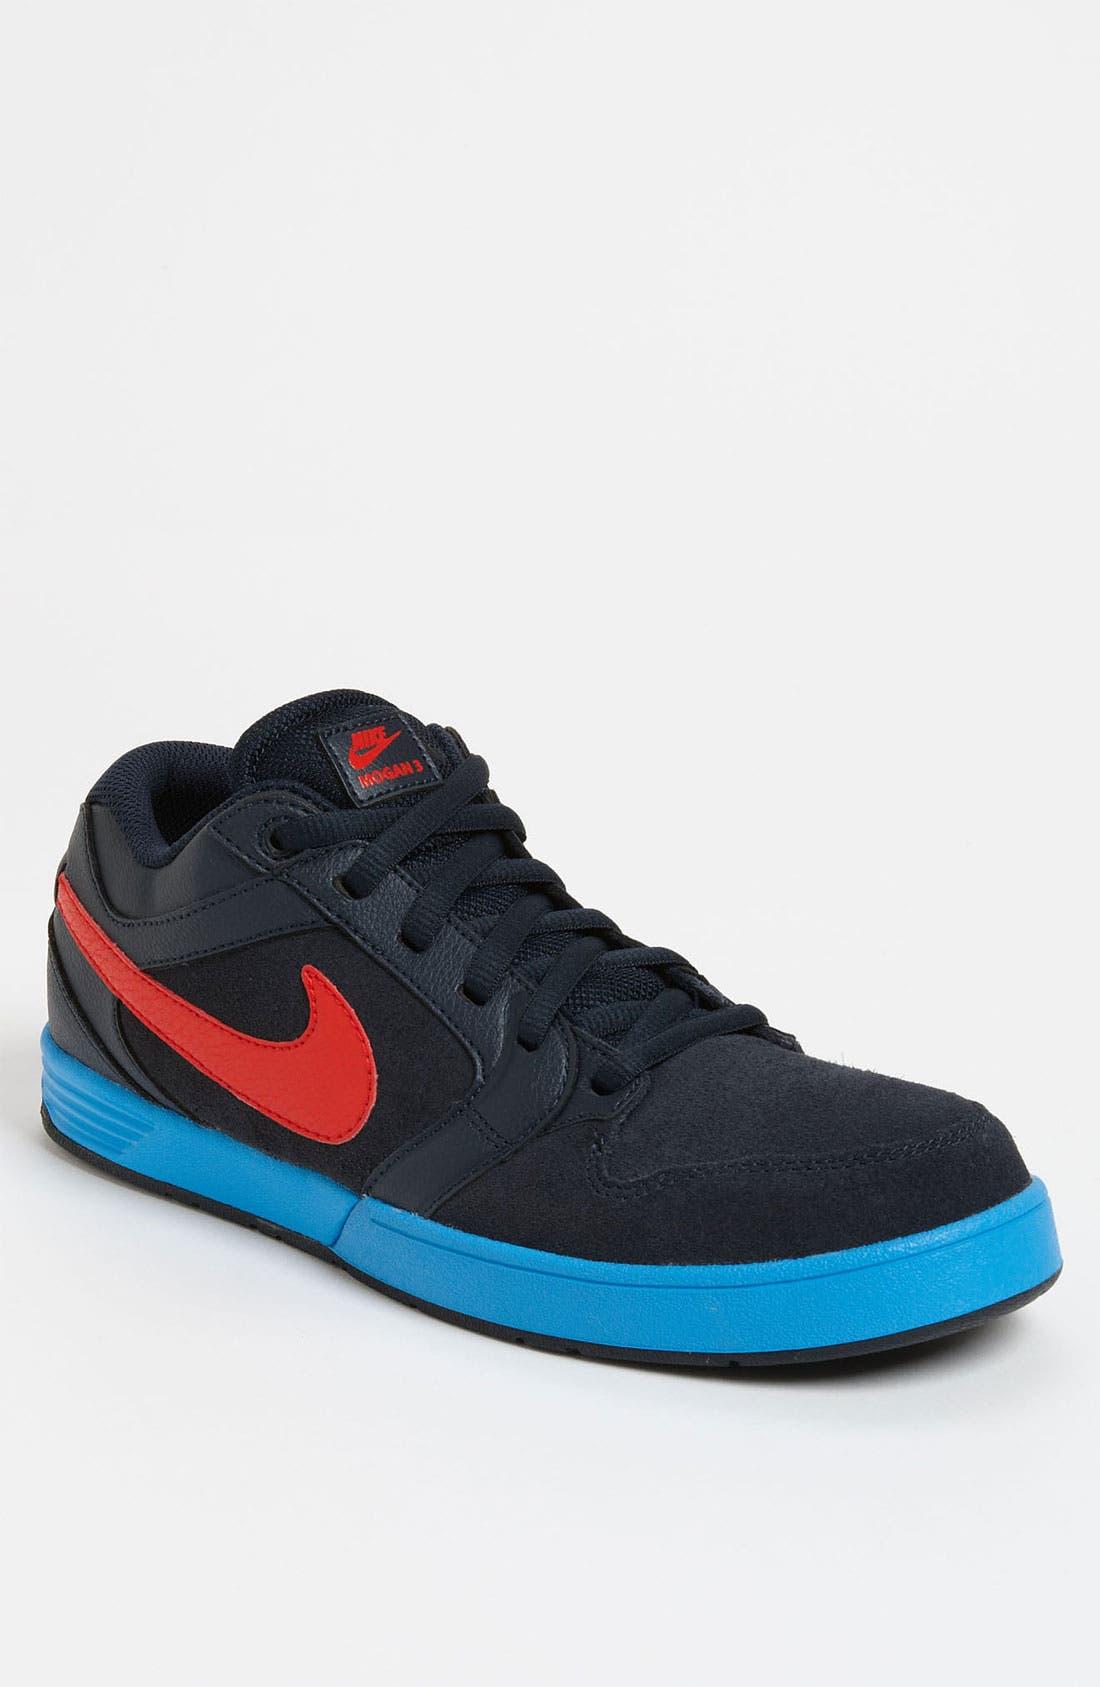 Main Image - Nike 'Mogan 3' Sneaker (Men) (Online Only)